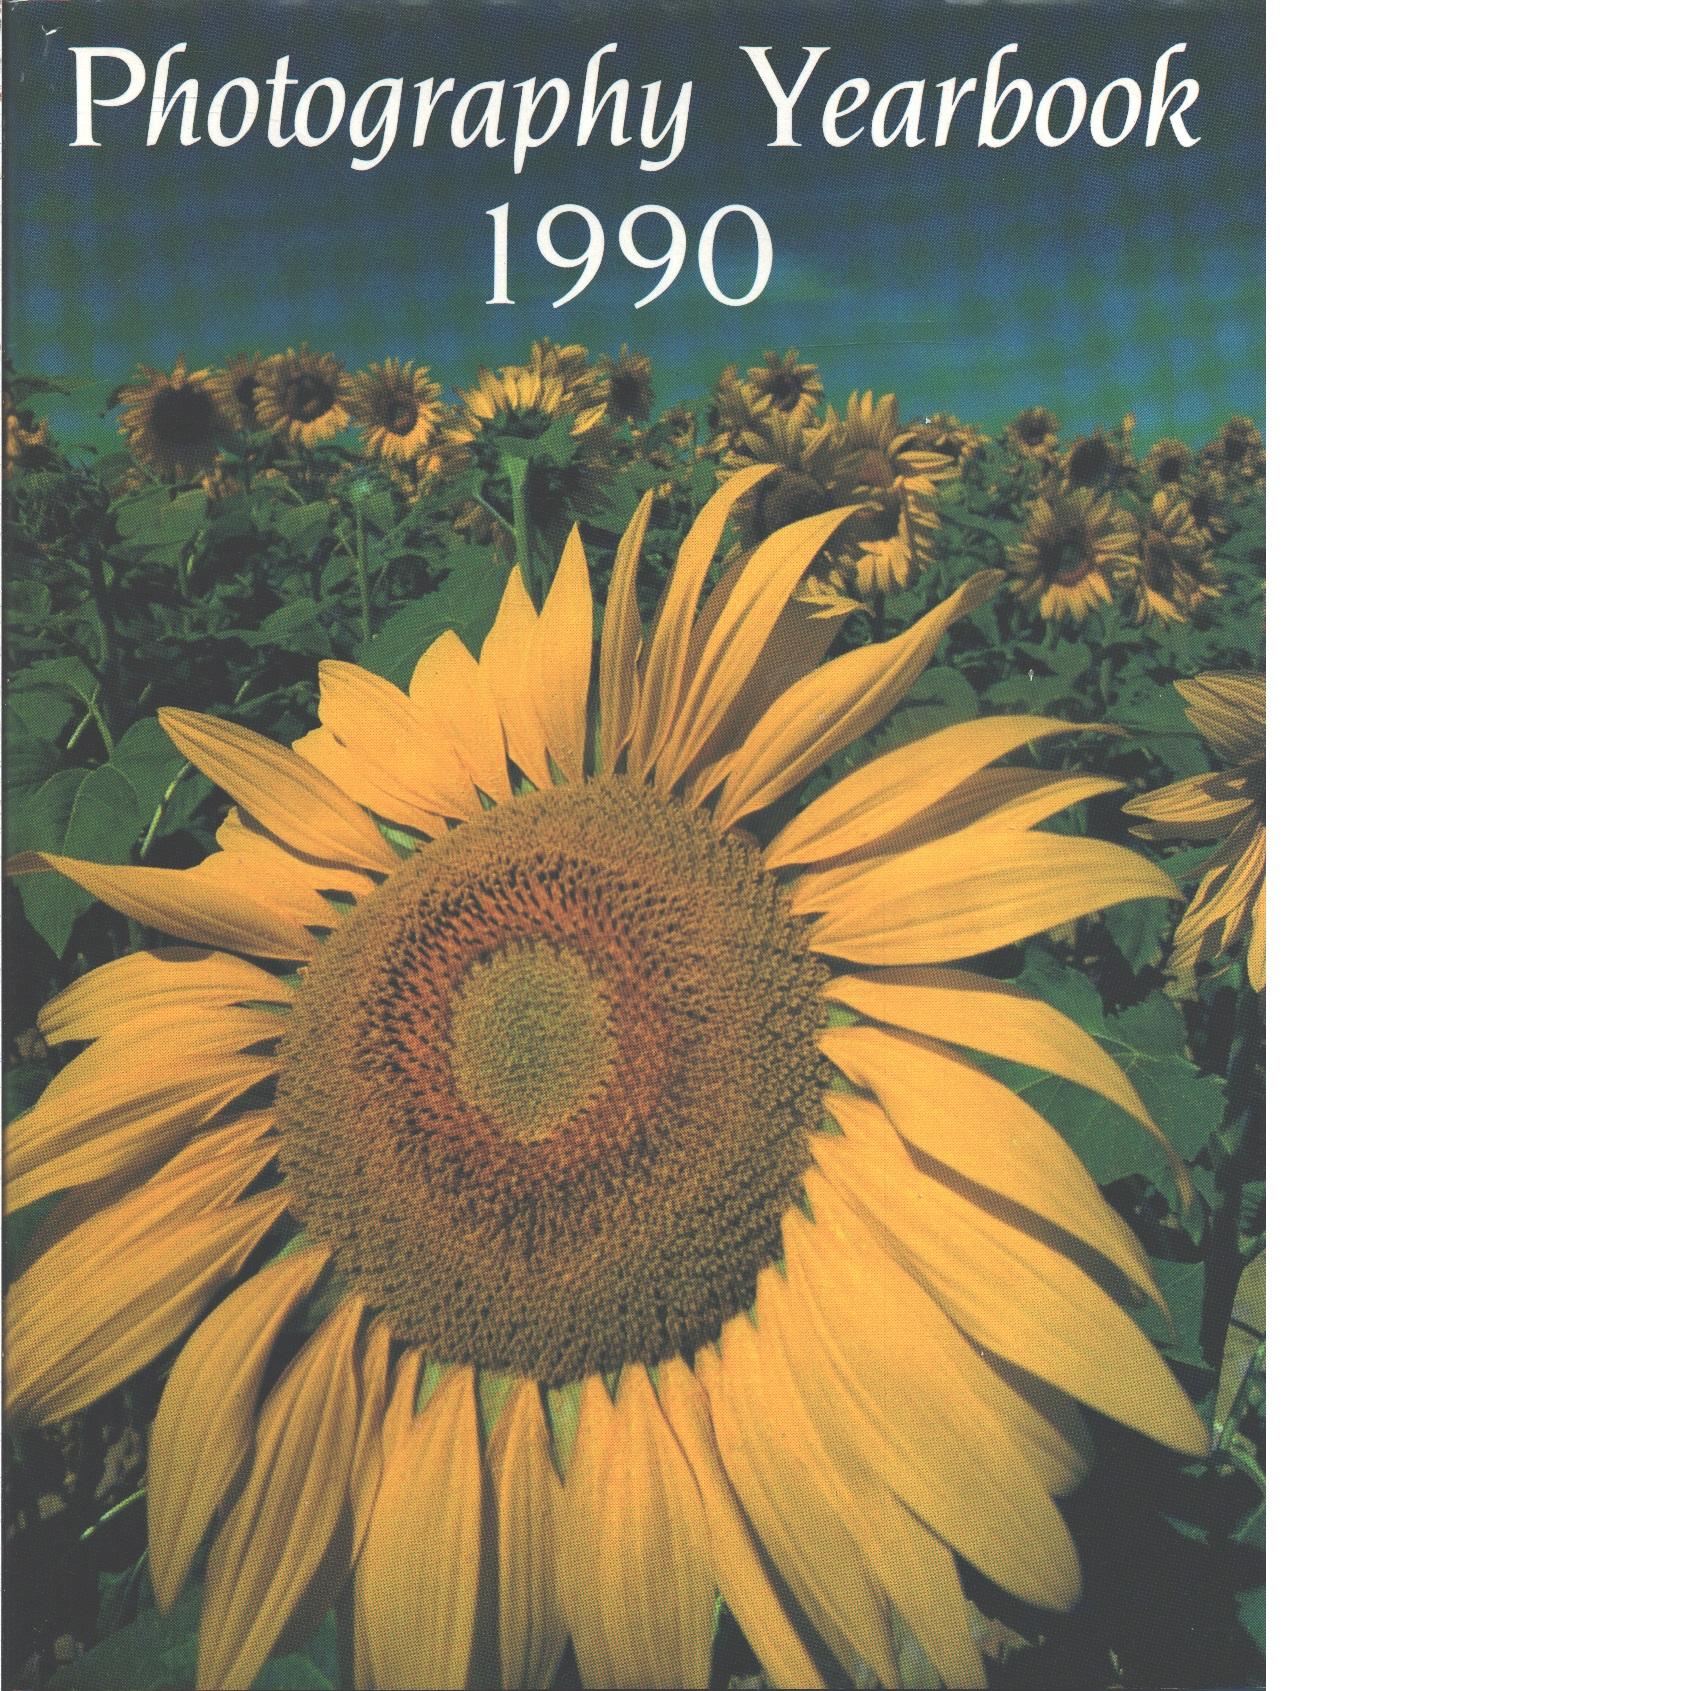 Photography Yearbook 1990 -  Wilkinson, Peter